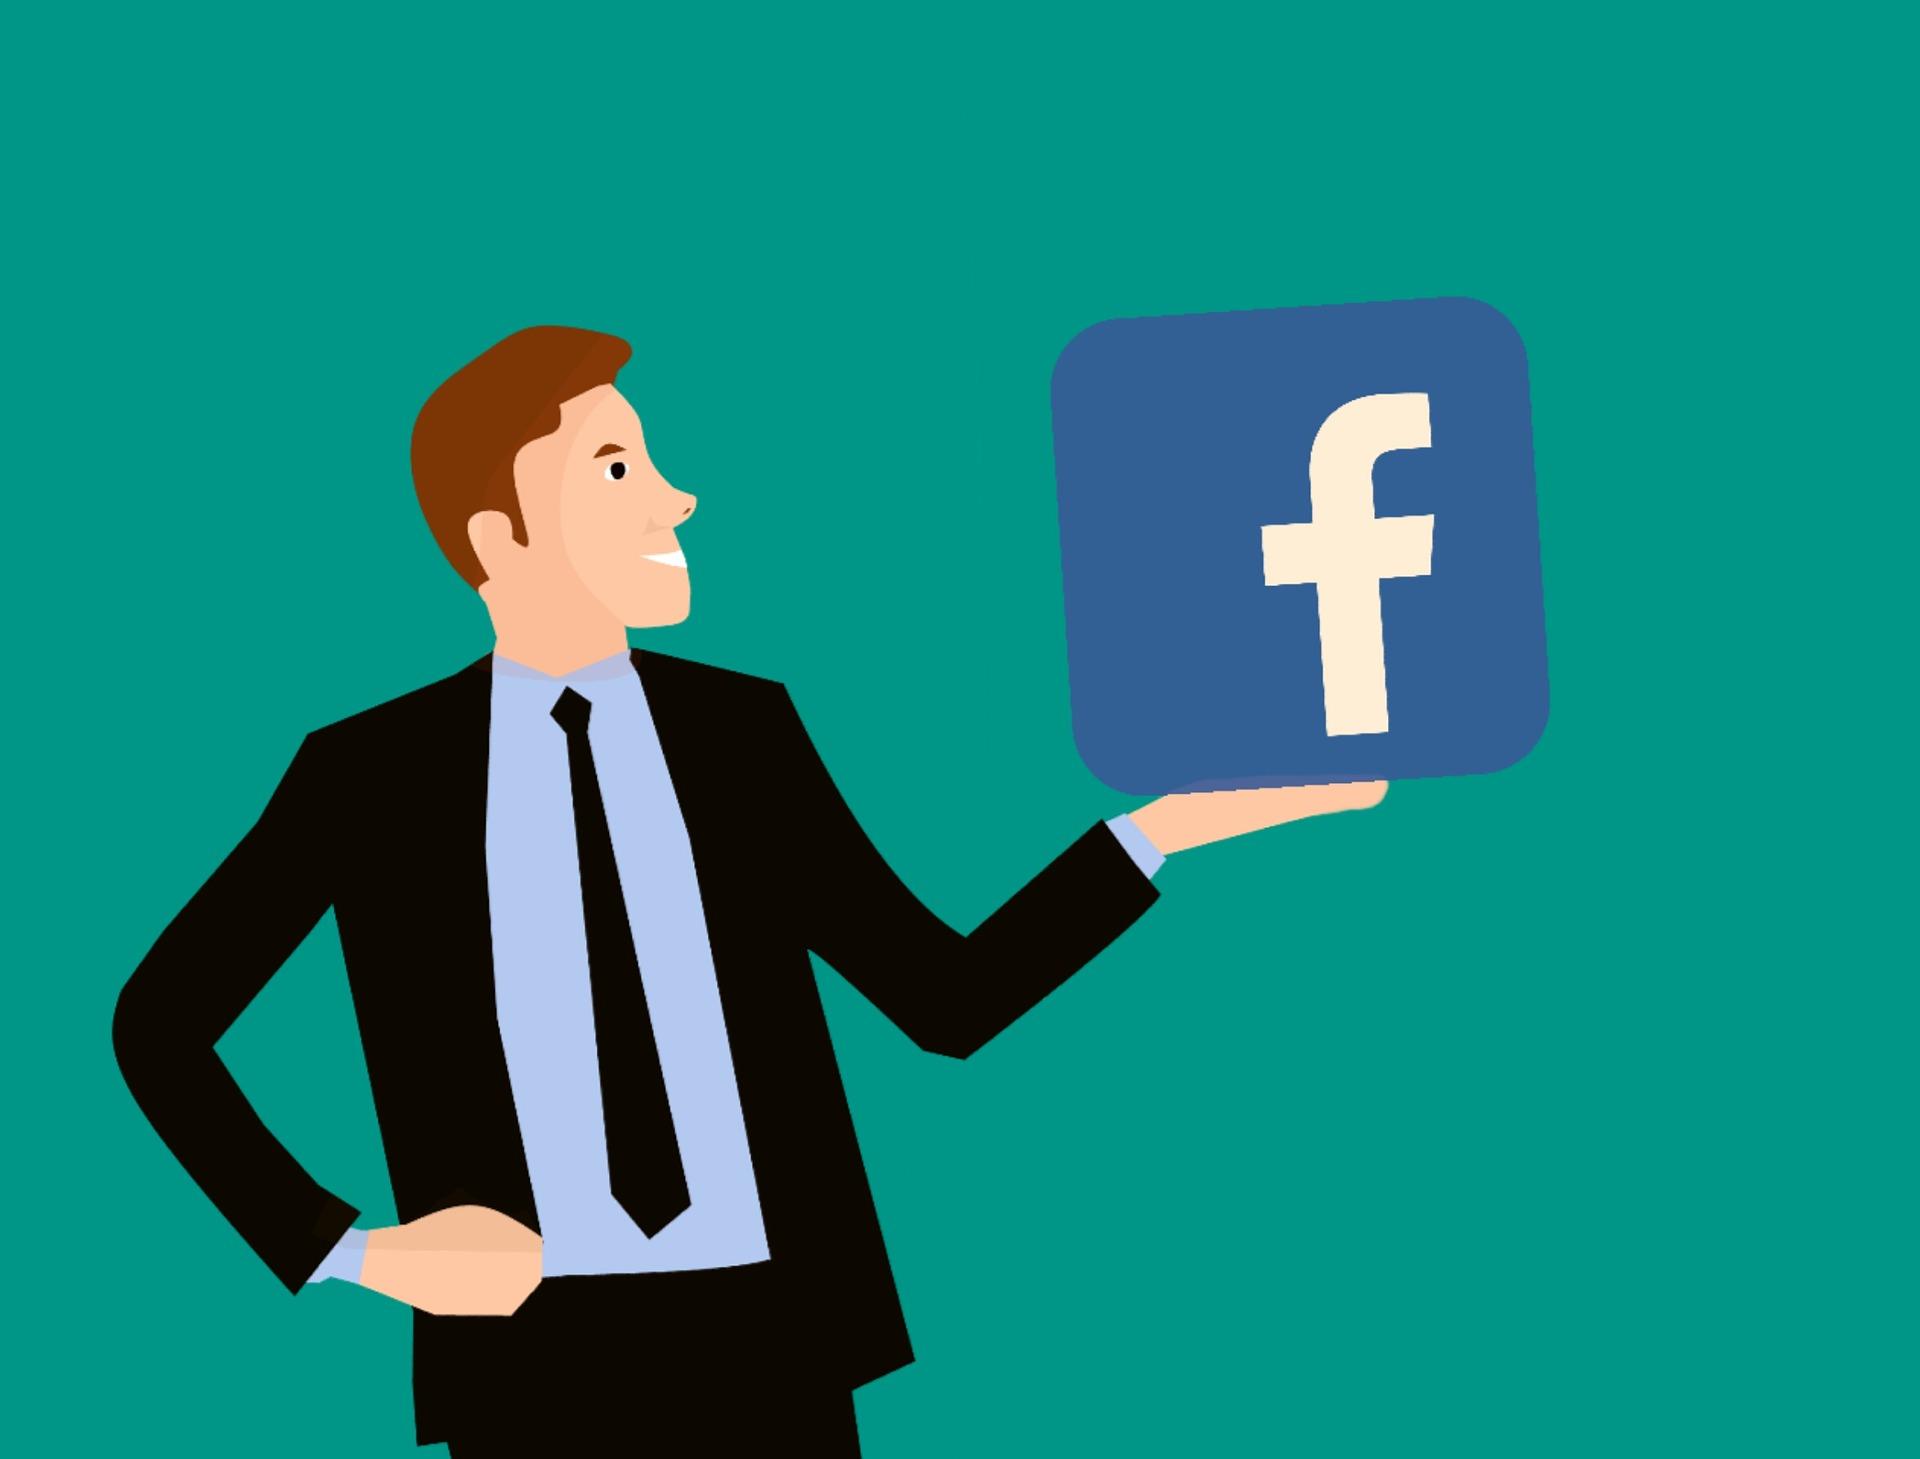 Express Wi-Fi ของ Facebook ช่วยให้ผู้ใช้เข้าถึงอินเทอร์เน็ตได้มากยิ่งขึ้น